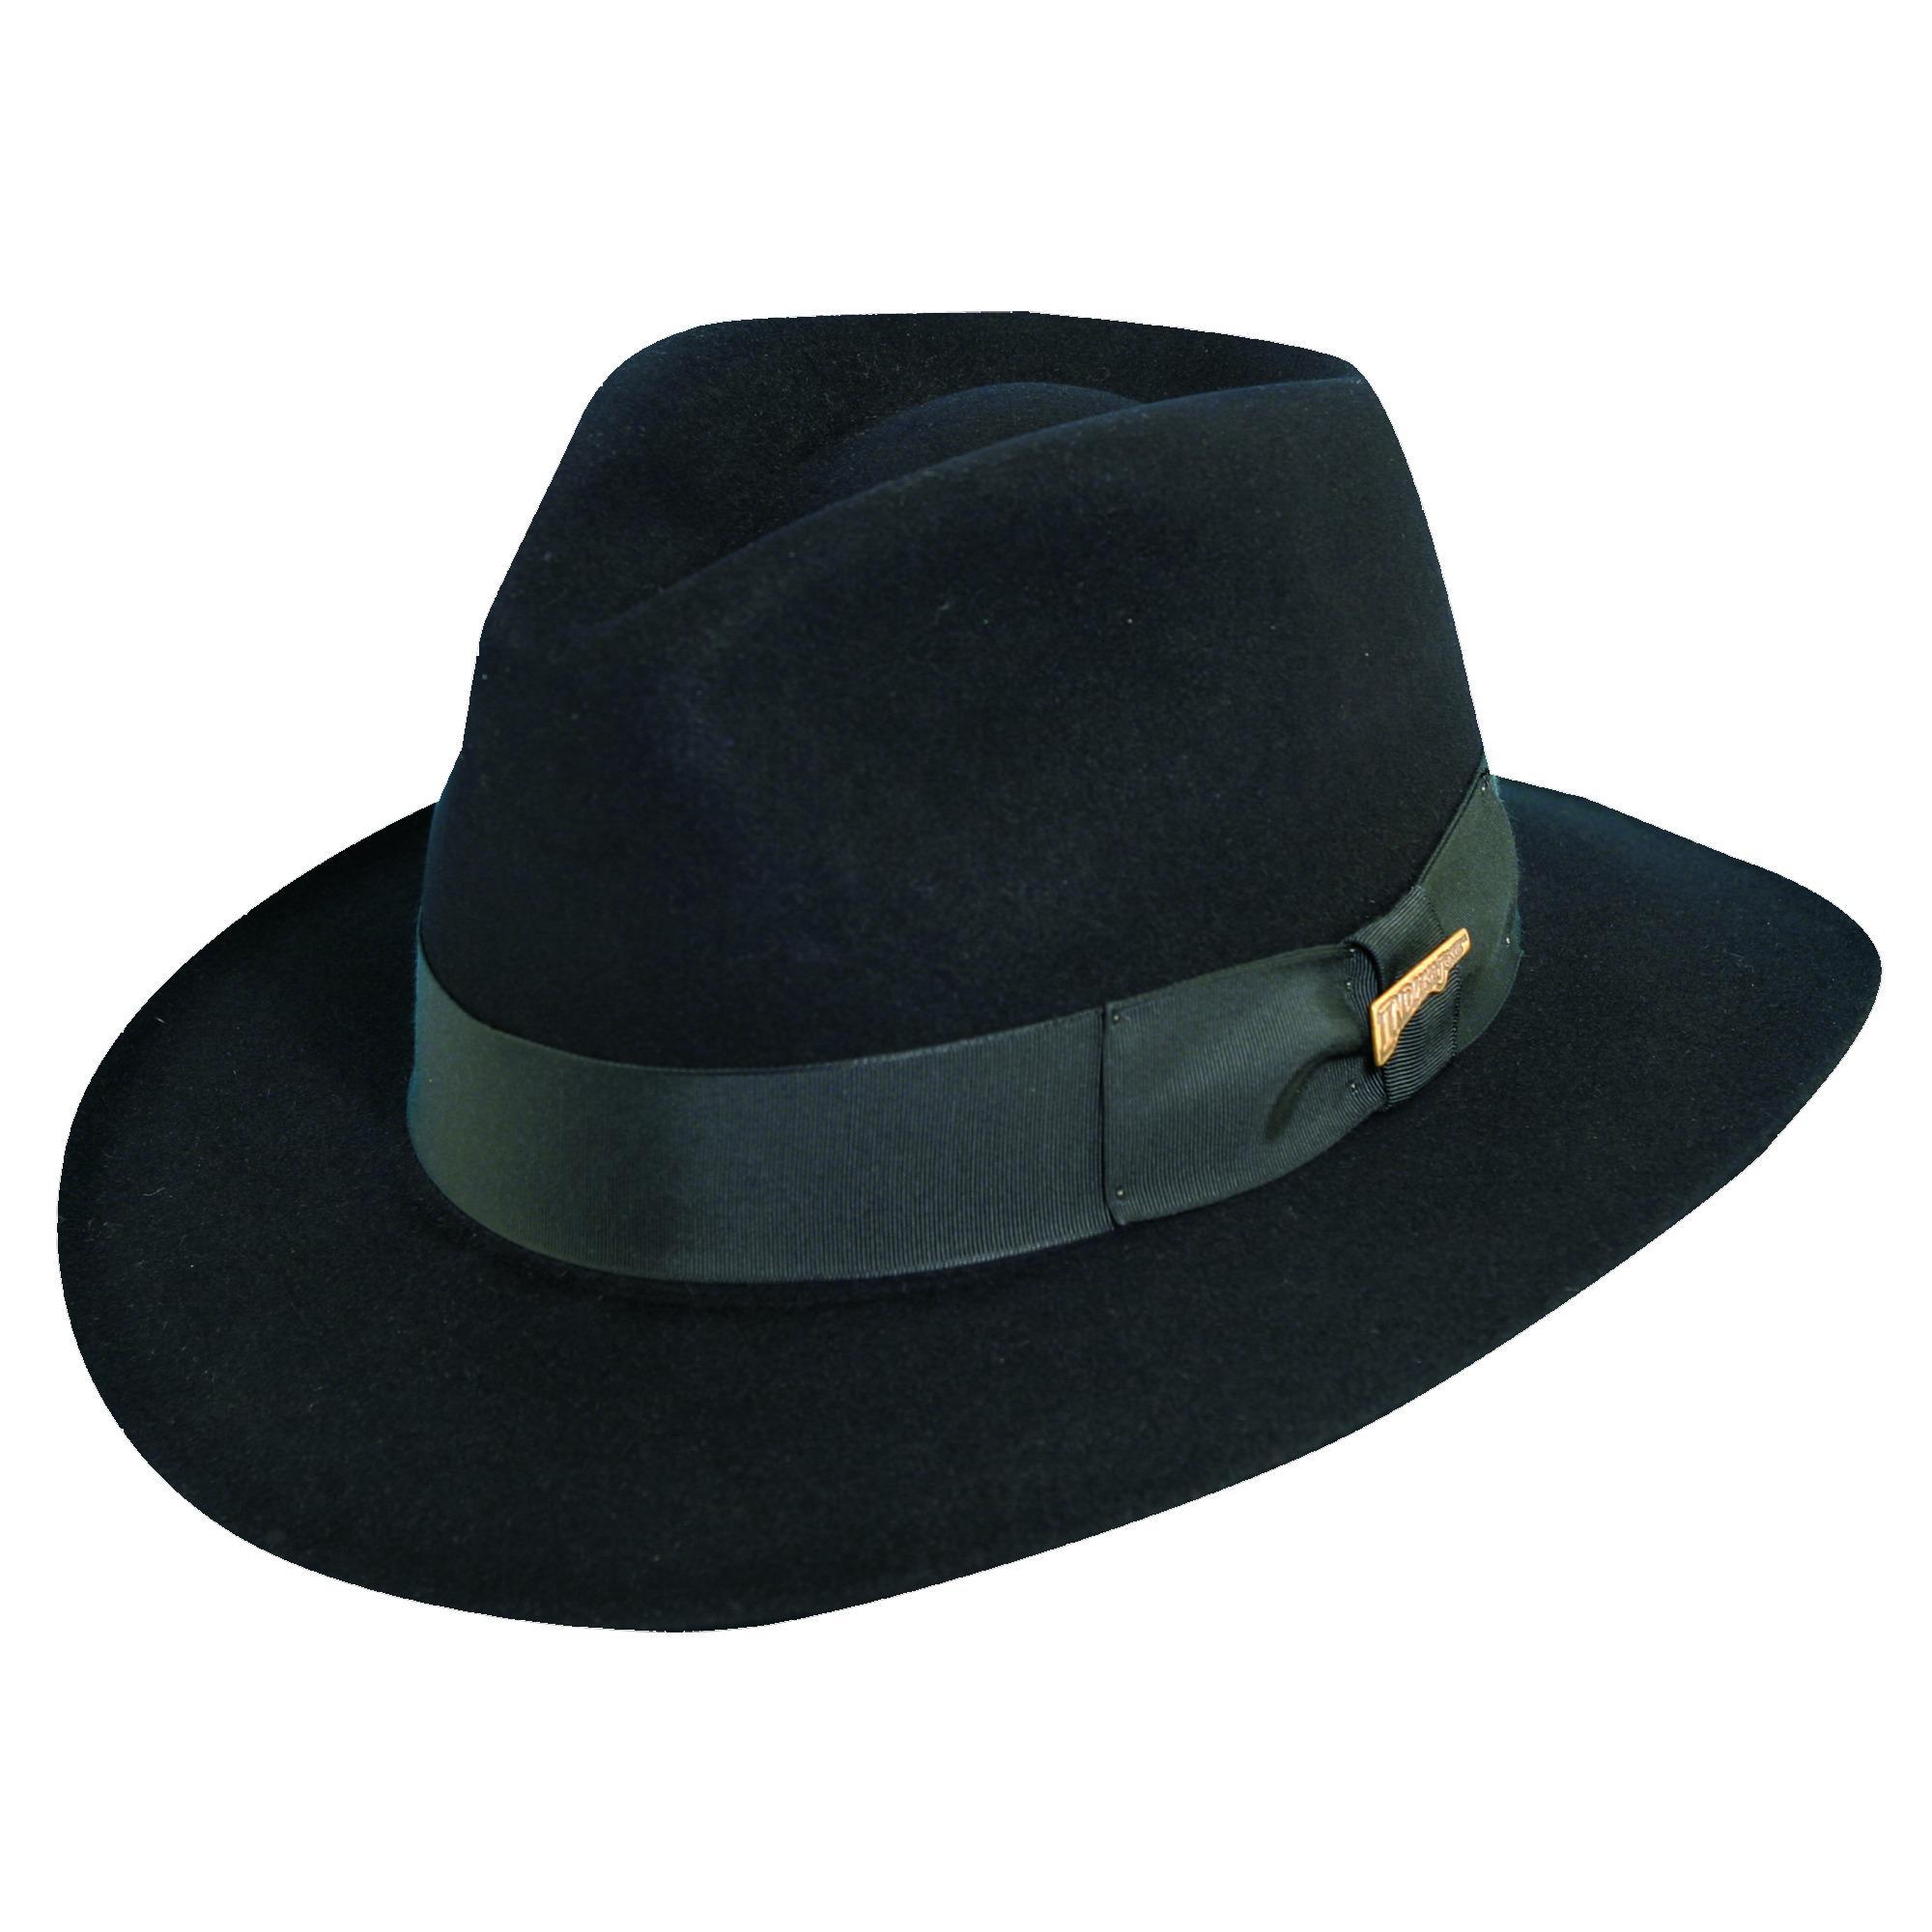 6dfebe4bc27cd Dorfman Pacific Men s Fur Felt Indiana Jones 2.5 Inch Brim Fedora Hat